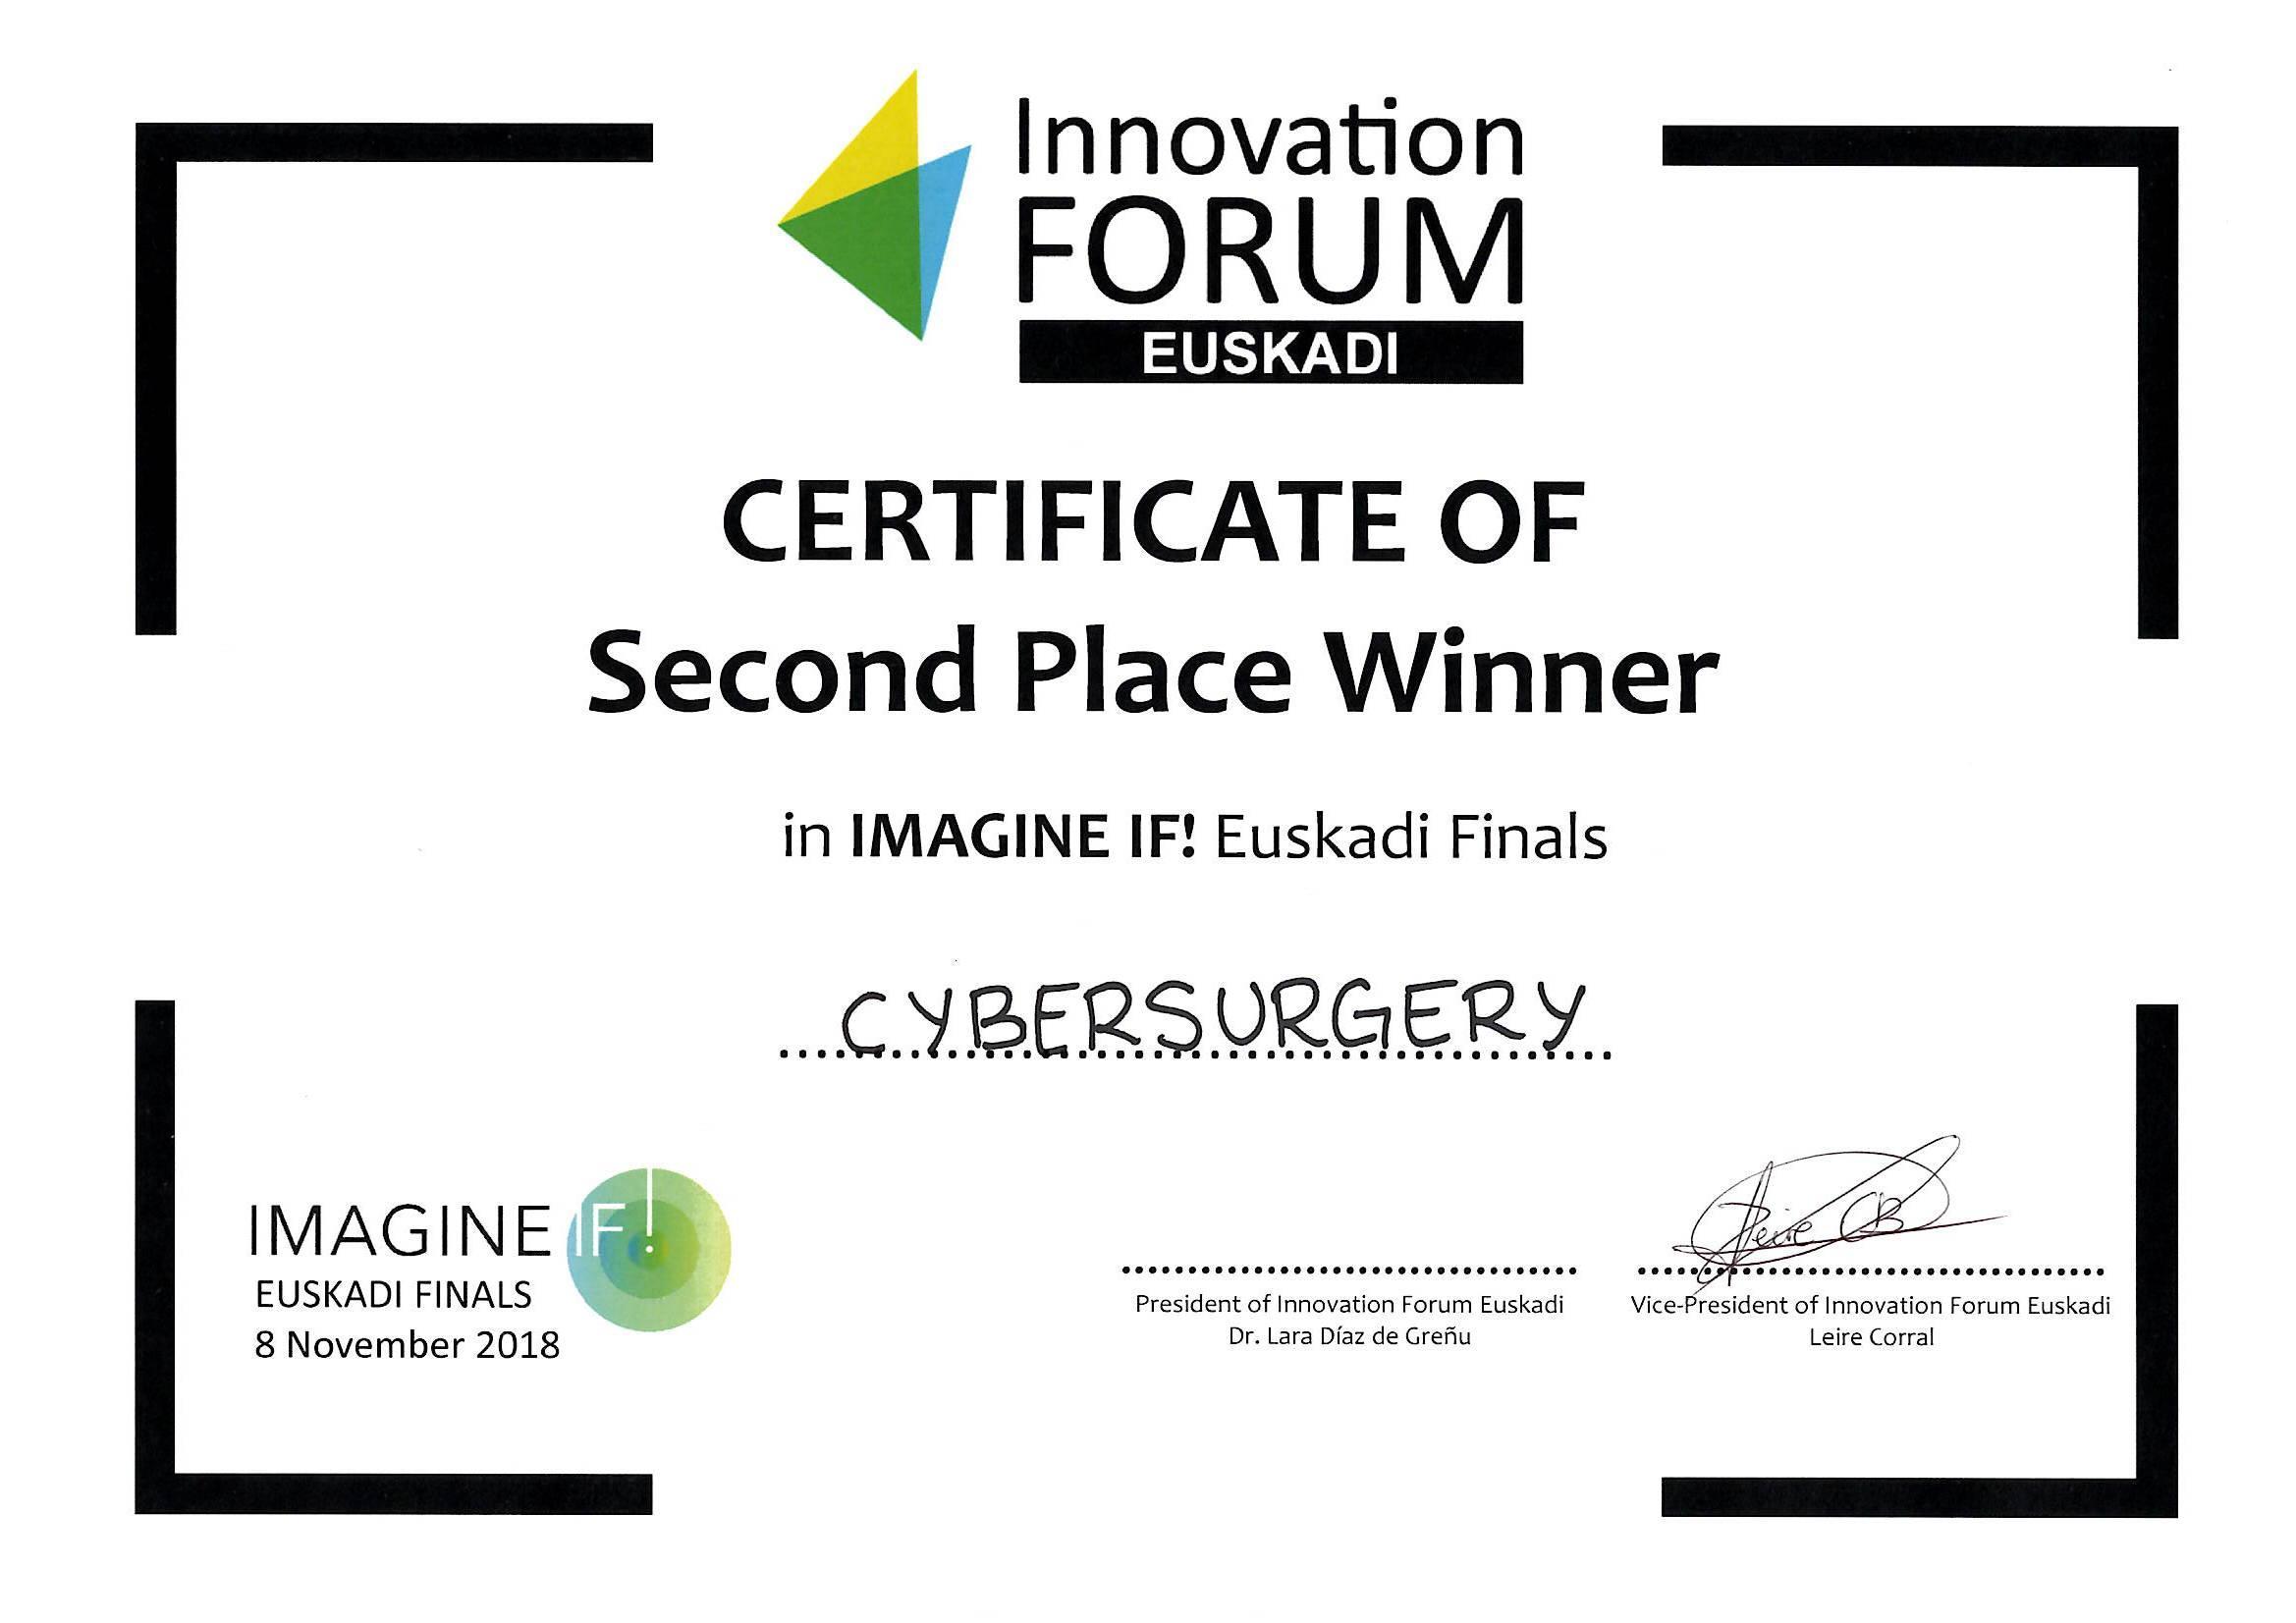 Cyber Surgery Forum Innovation